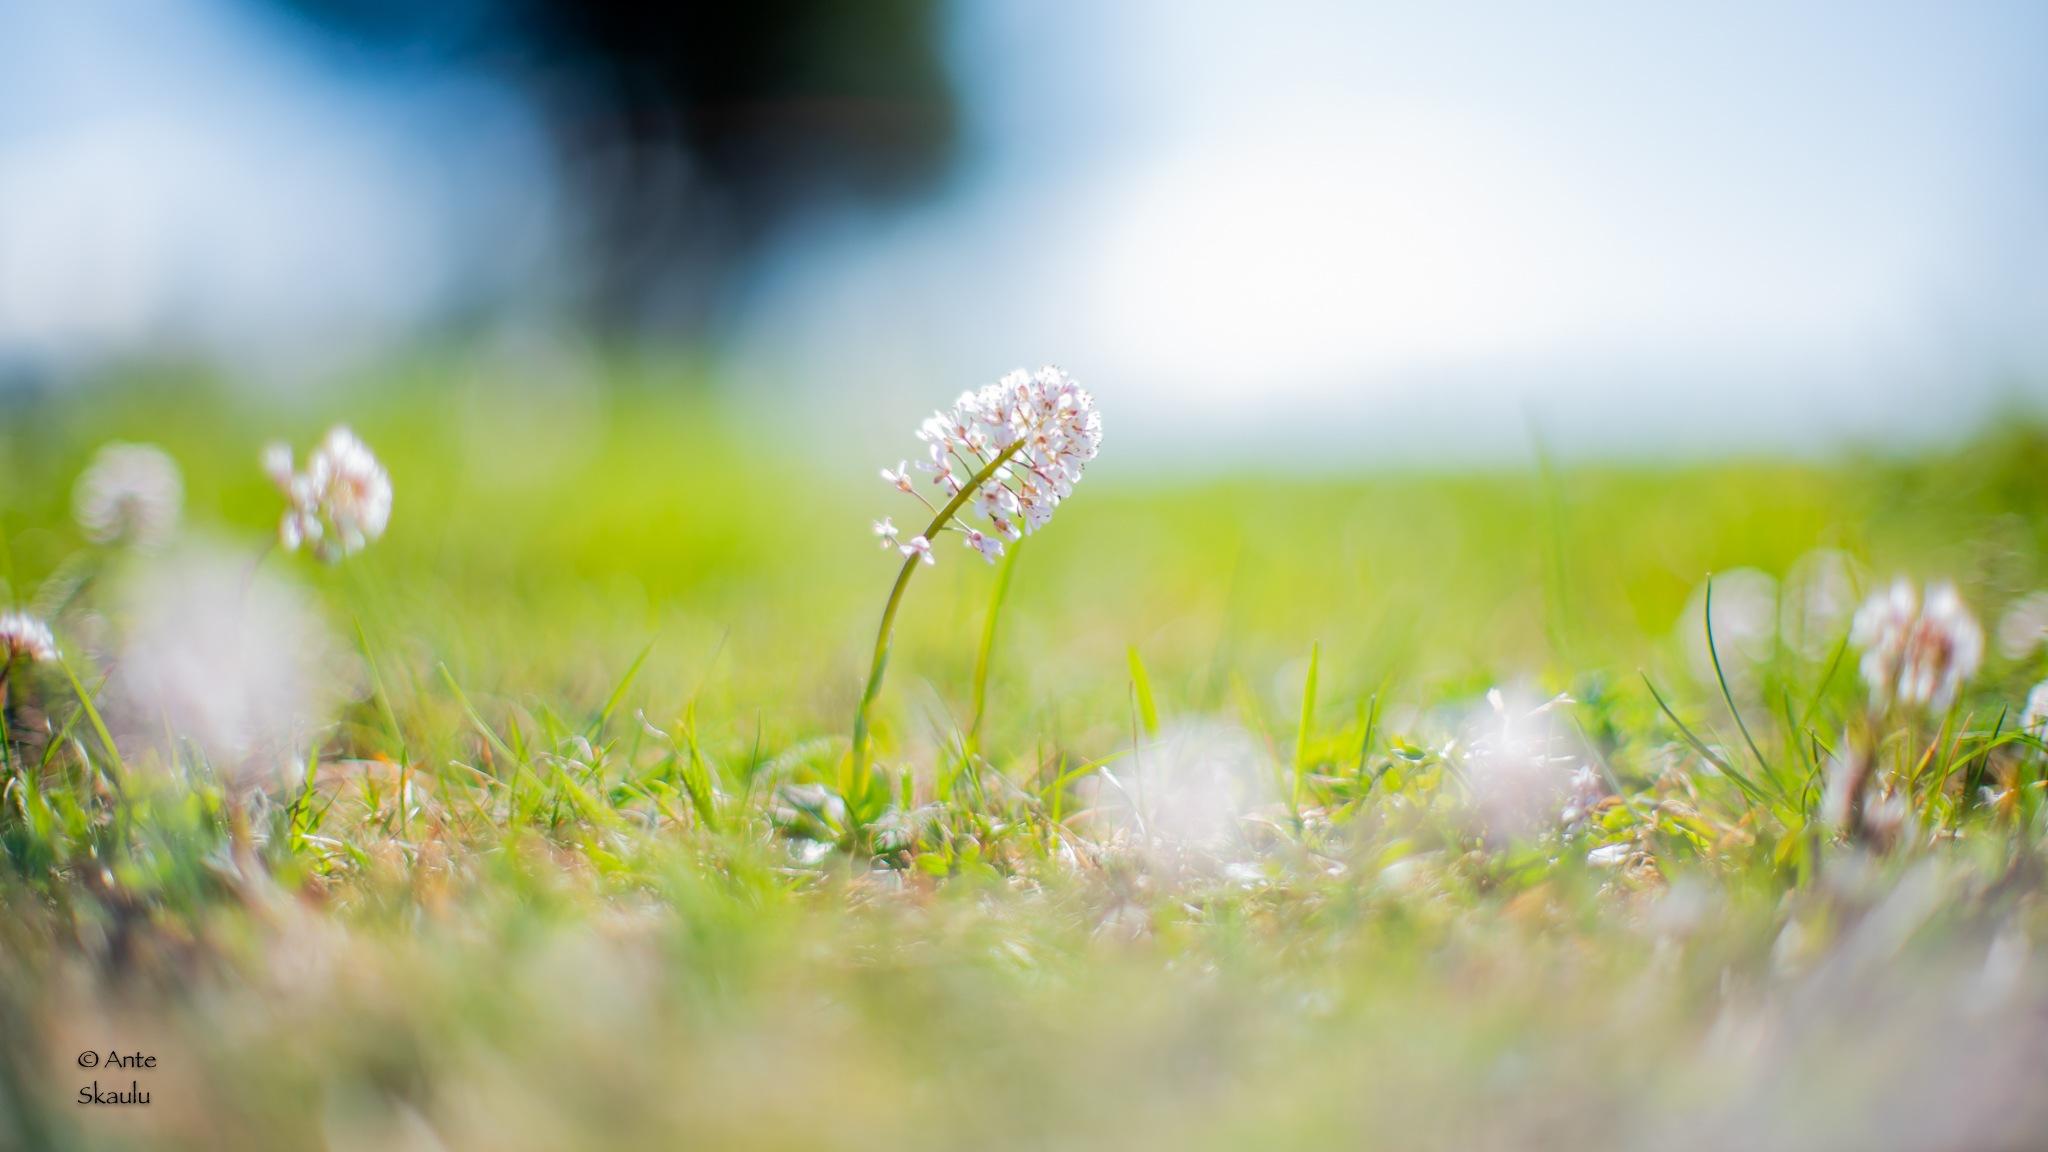 flower by Ante Skaulu @photo_catched_by_a.skaulu